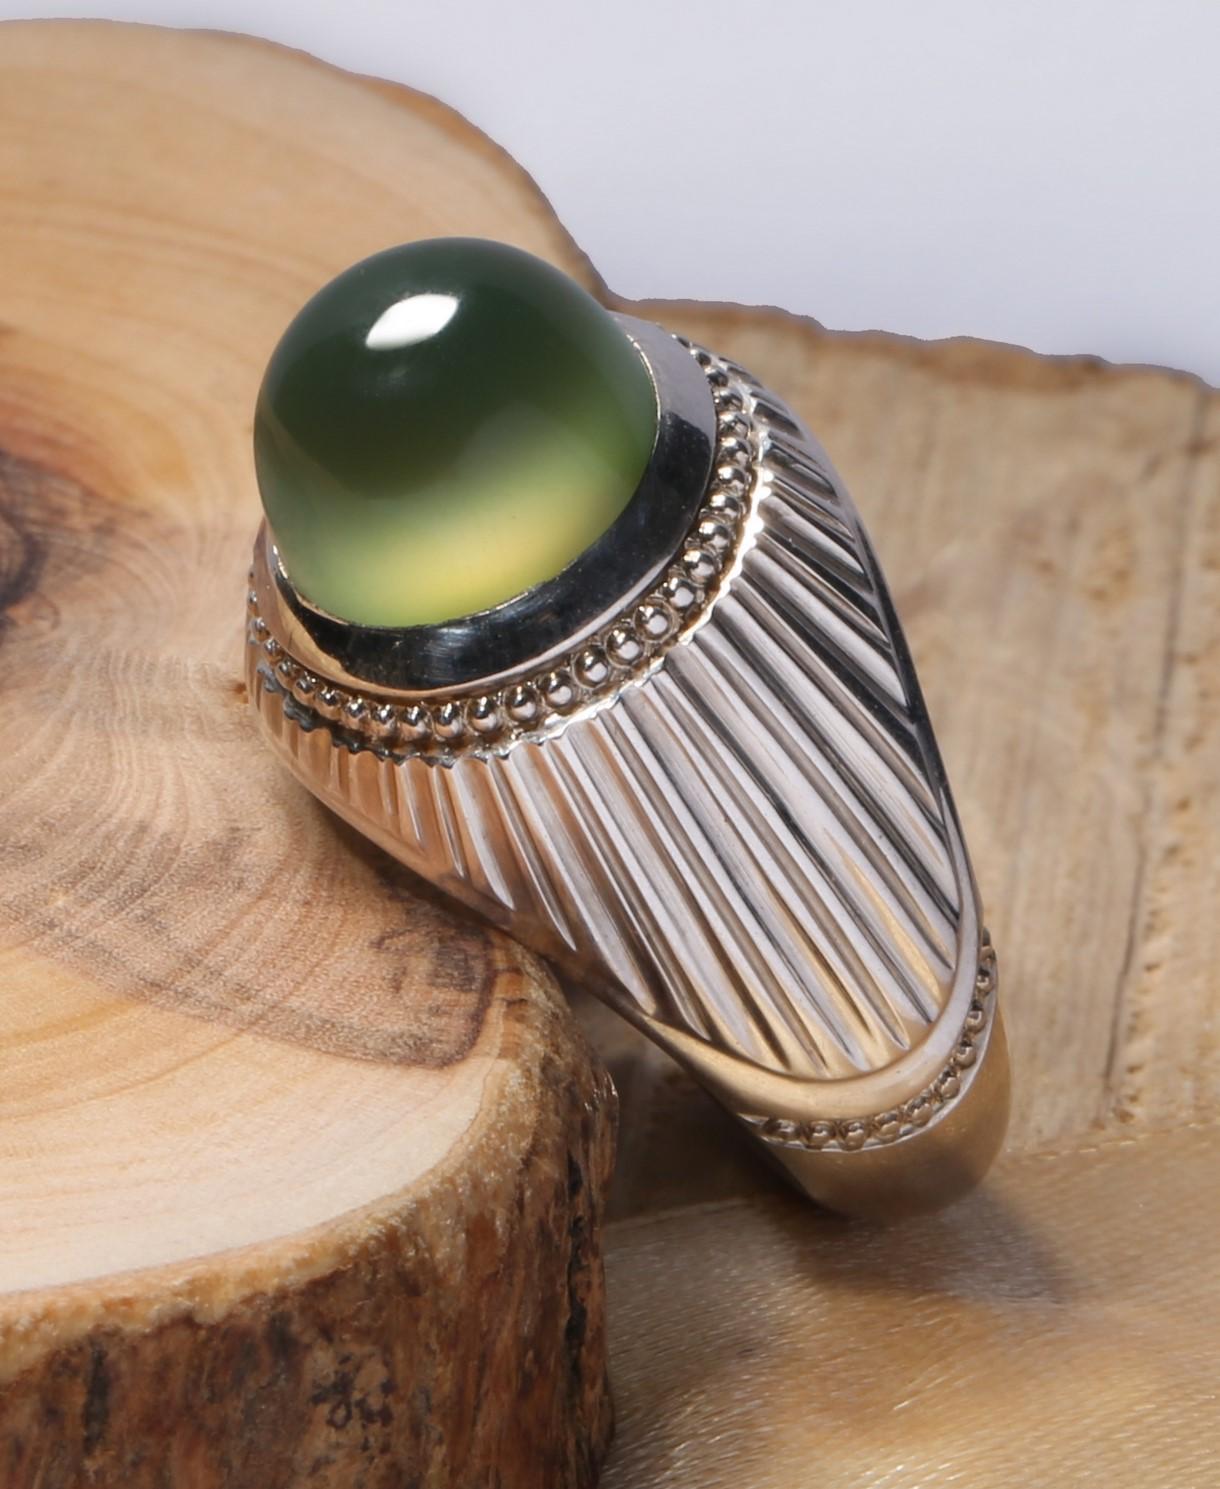 A-1531 انگشتر عقیق سبز کهنه با پایه فدیوم دست ساز